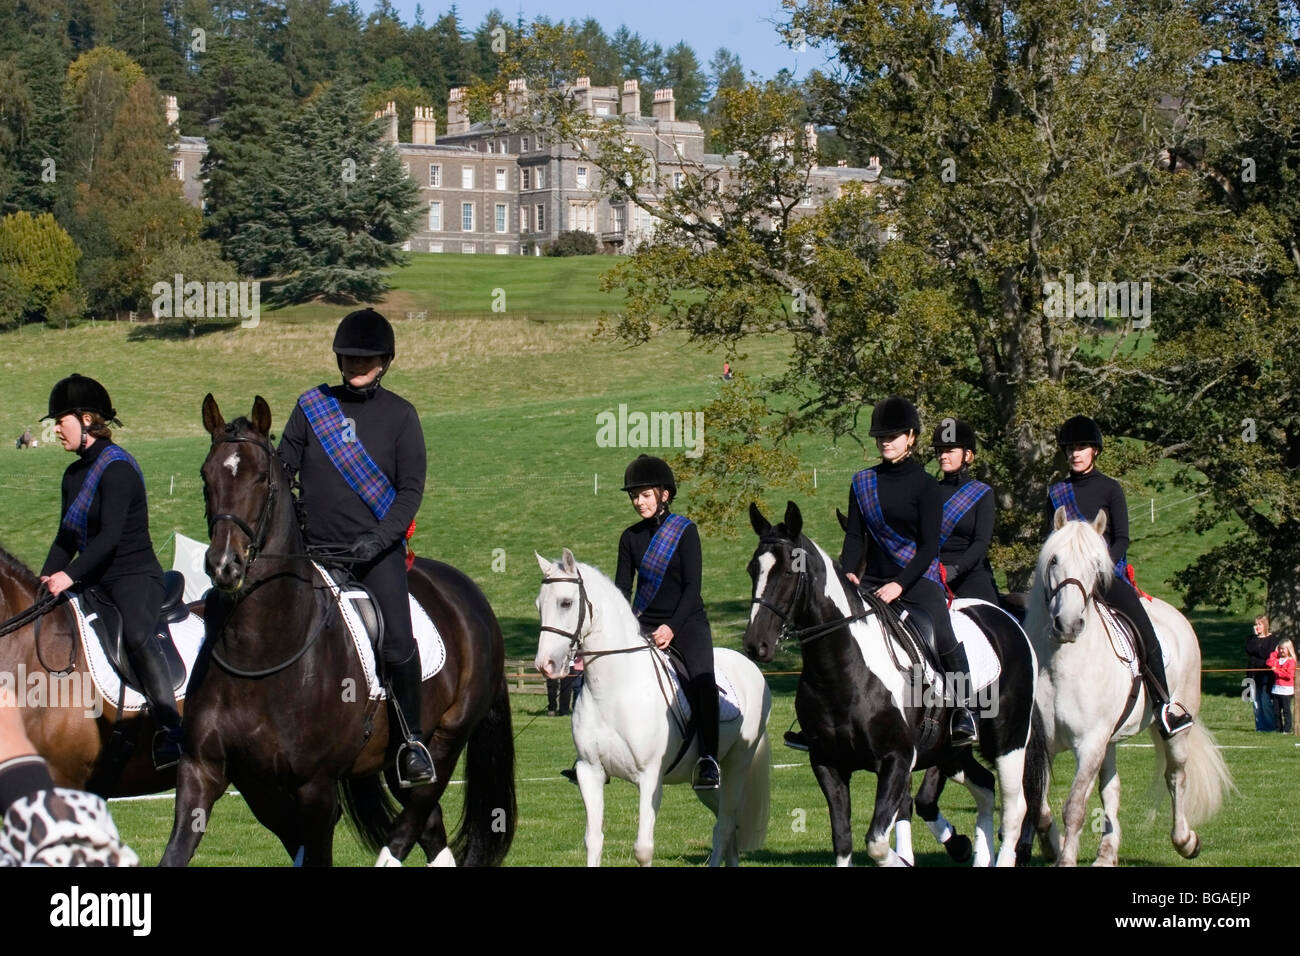 Horse riding display at Bowhill, Selkirk, Scottish Borders - Stock Image